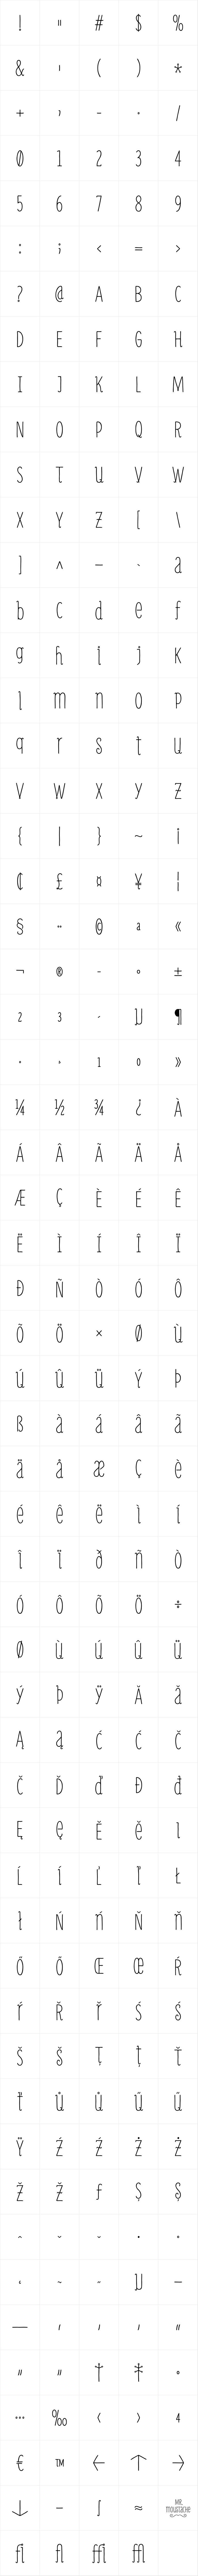 MrMoustache Text